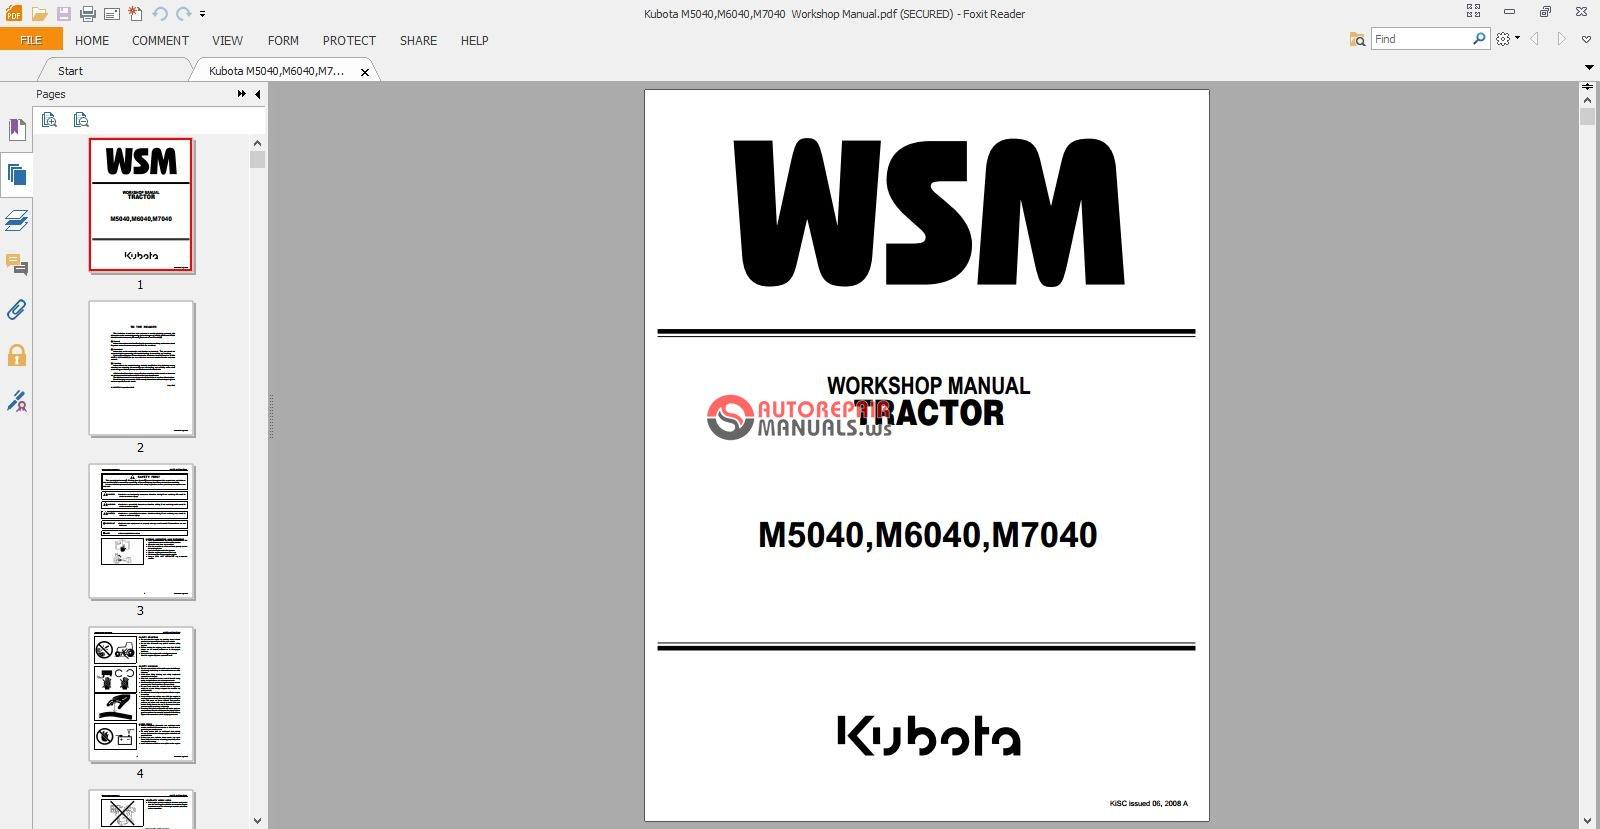 Kubota M5040 M6040 M7040 Workshop Manual